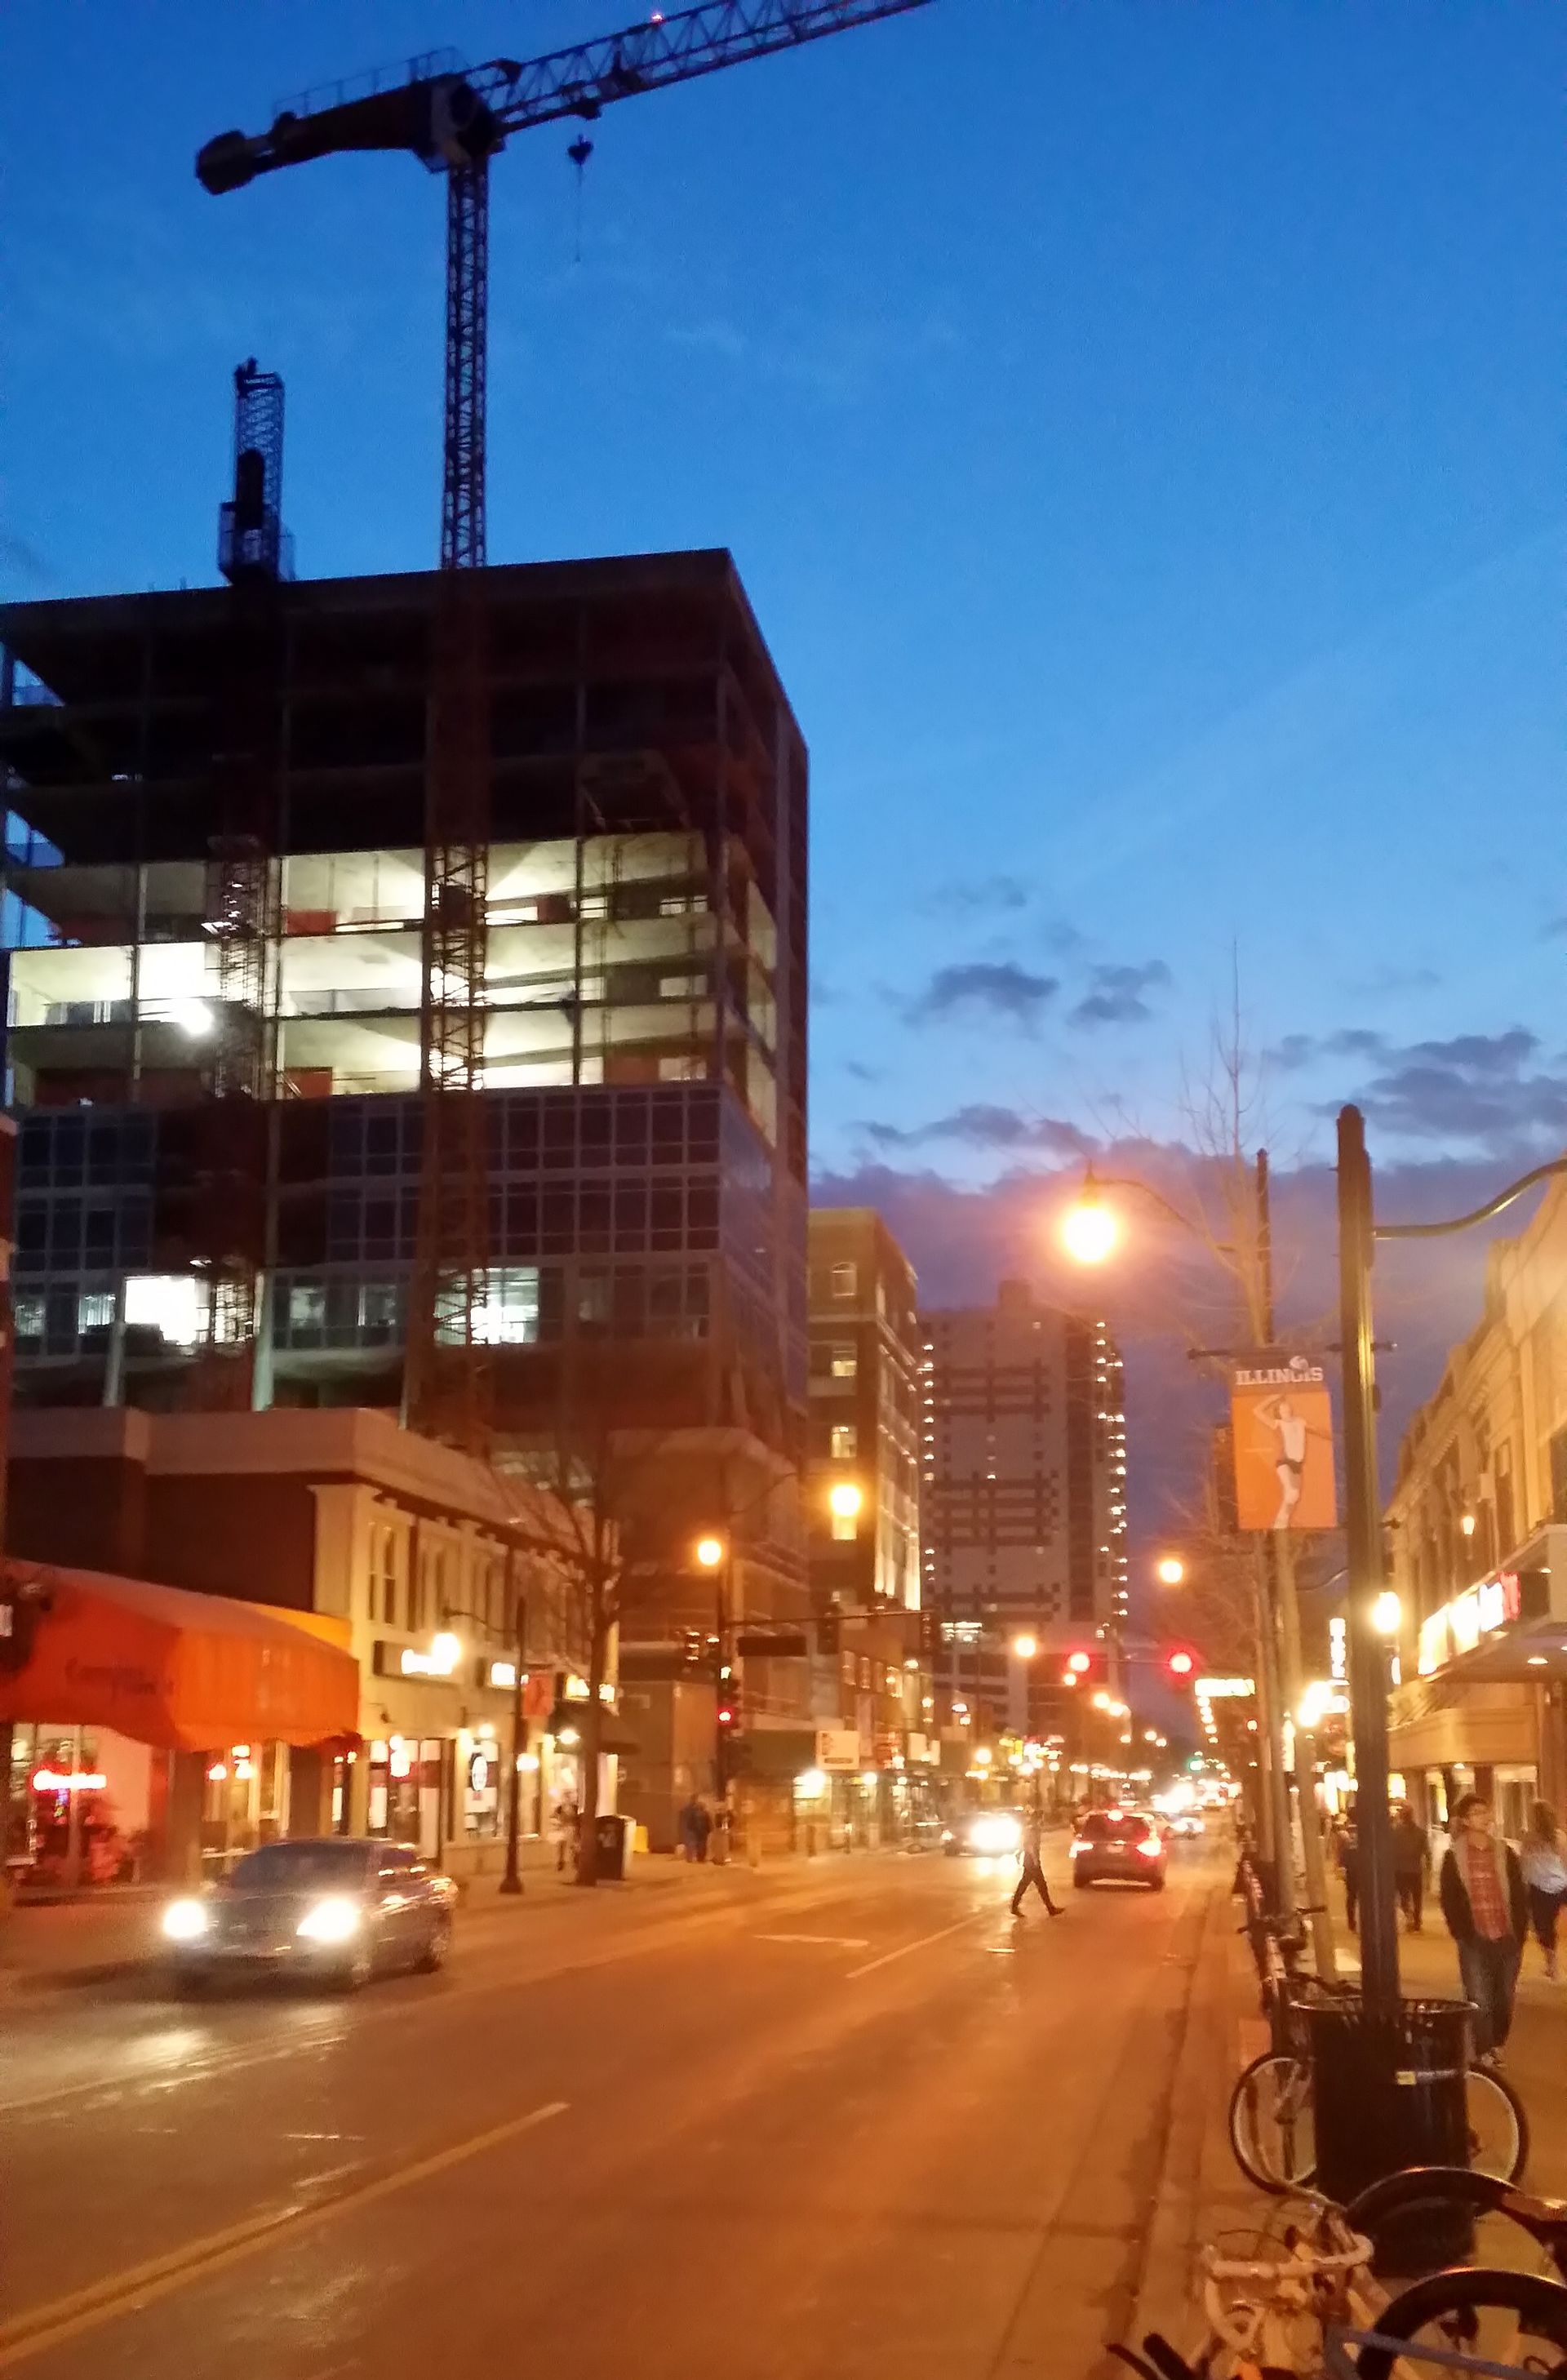 Champaign Bars And Restaurants